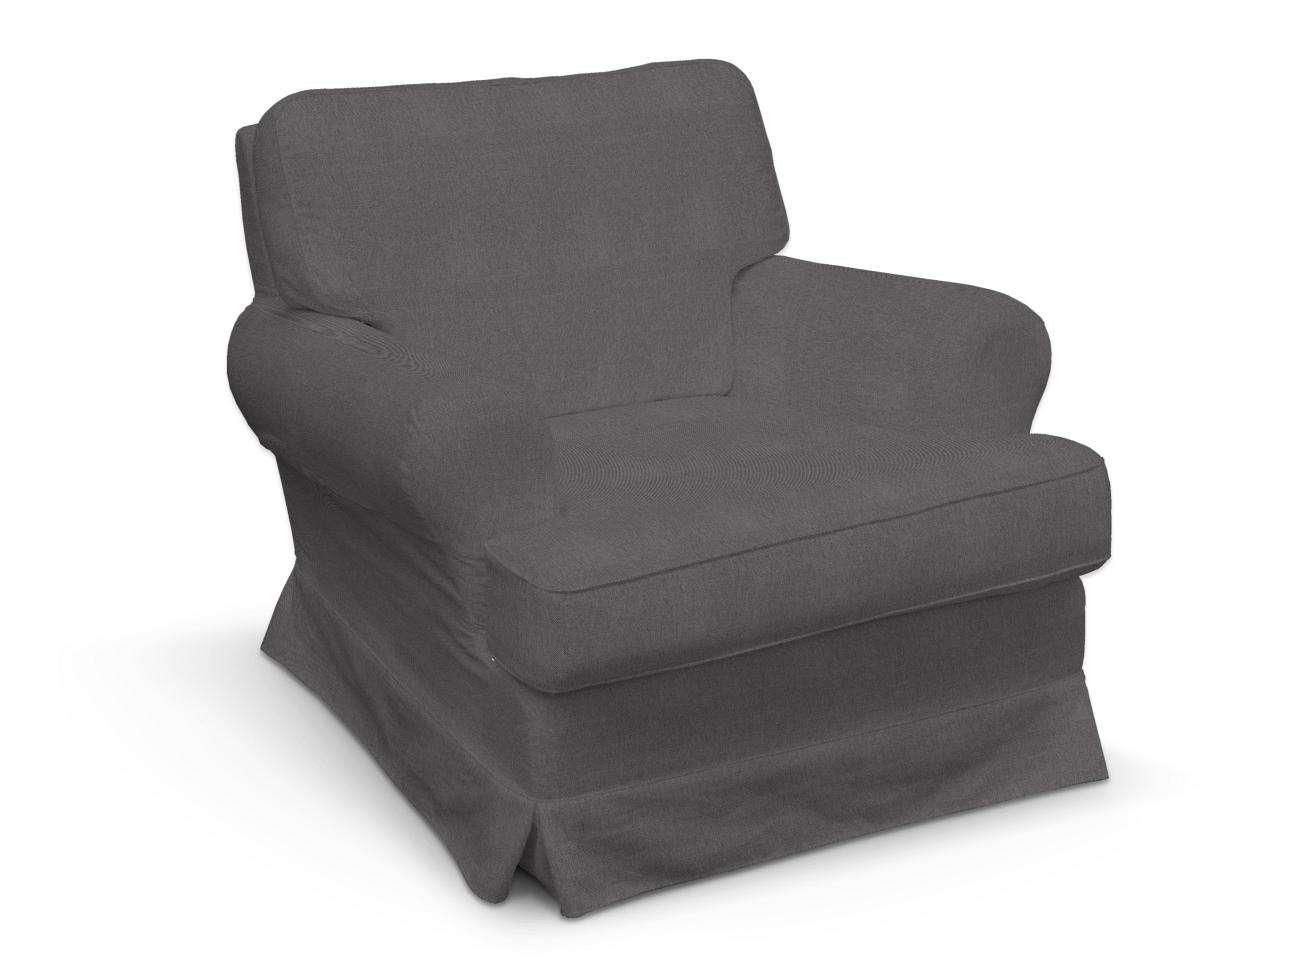 Barkaby Sesselbezug von der Kollektion Etna, Stoff: 705-35